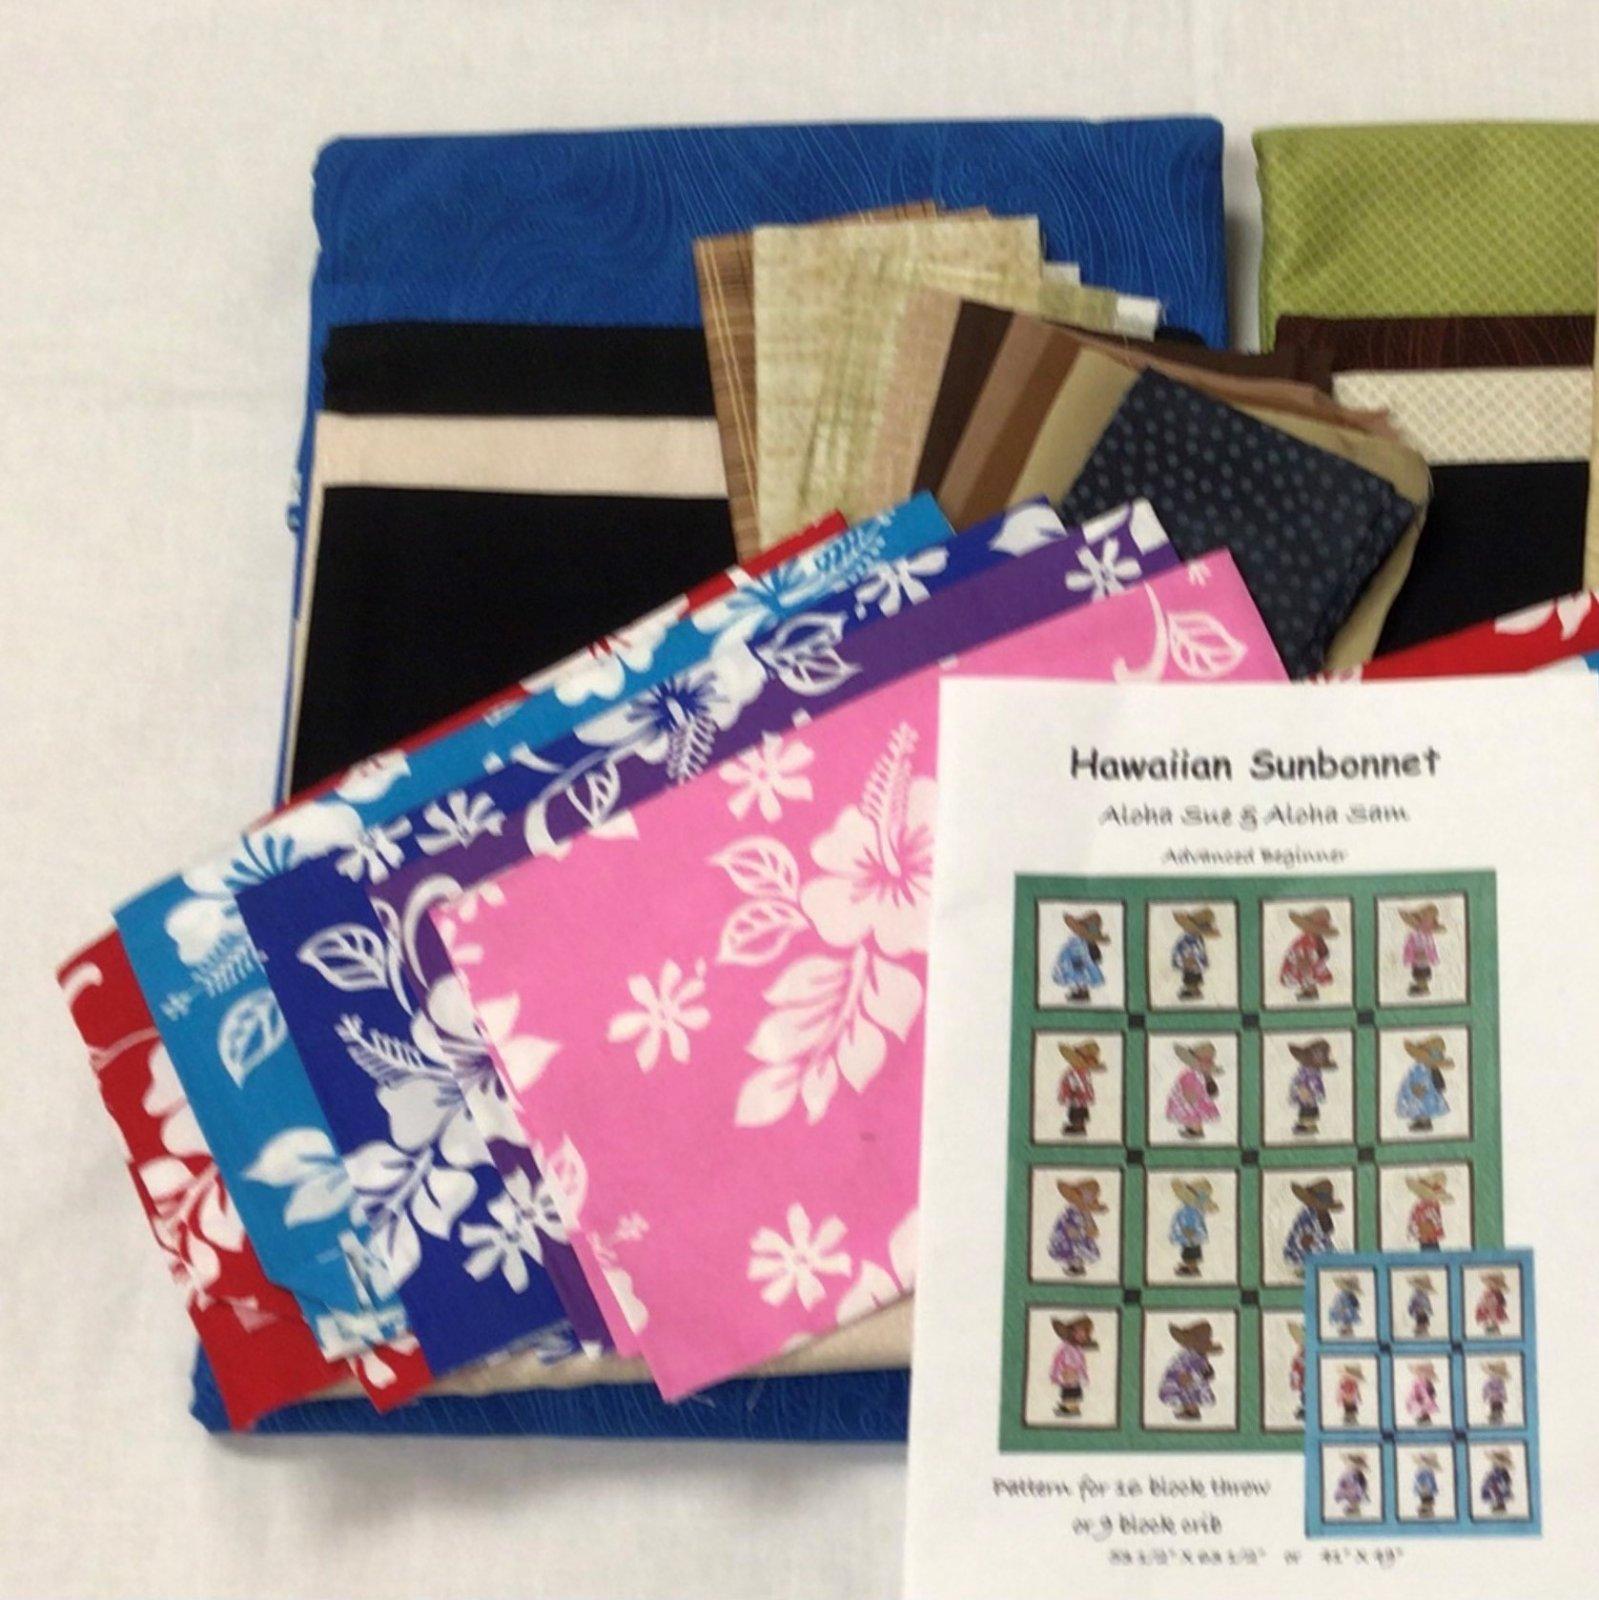 Hawaiian Sunbonnet Kit